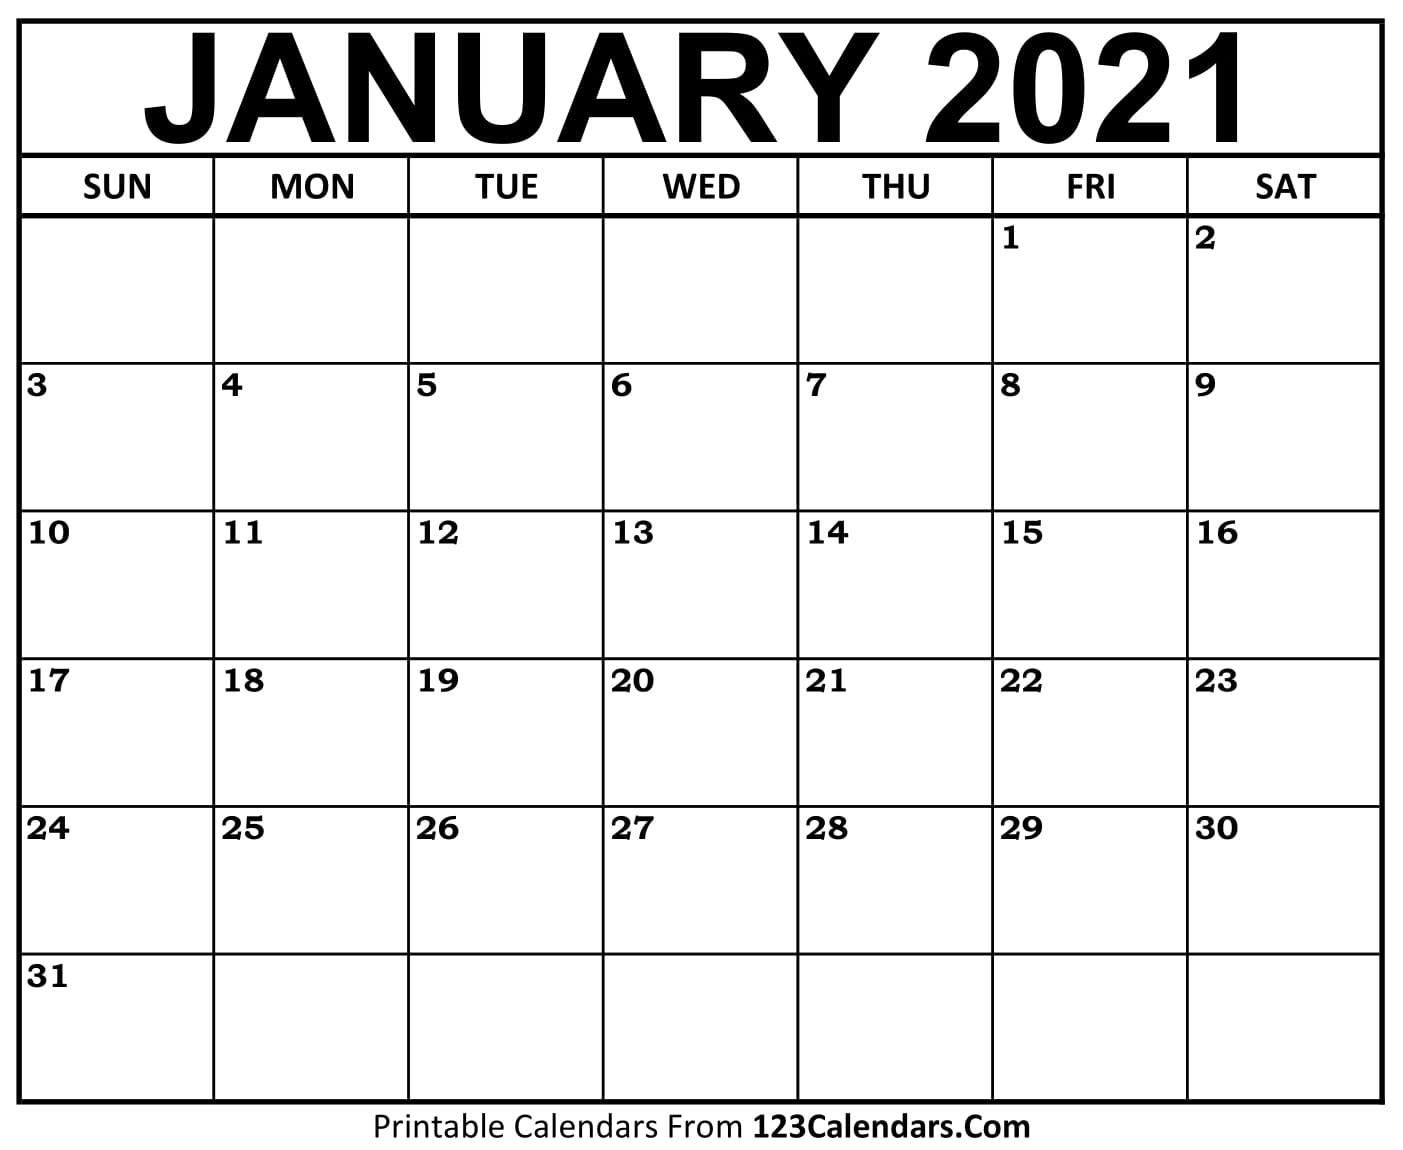 2021 Printable Calendar | 123Calendars  2021 Calendar Free Printable Bills